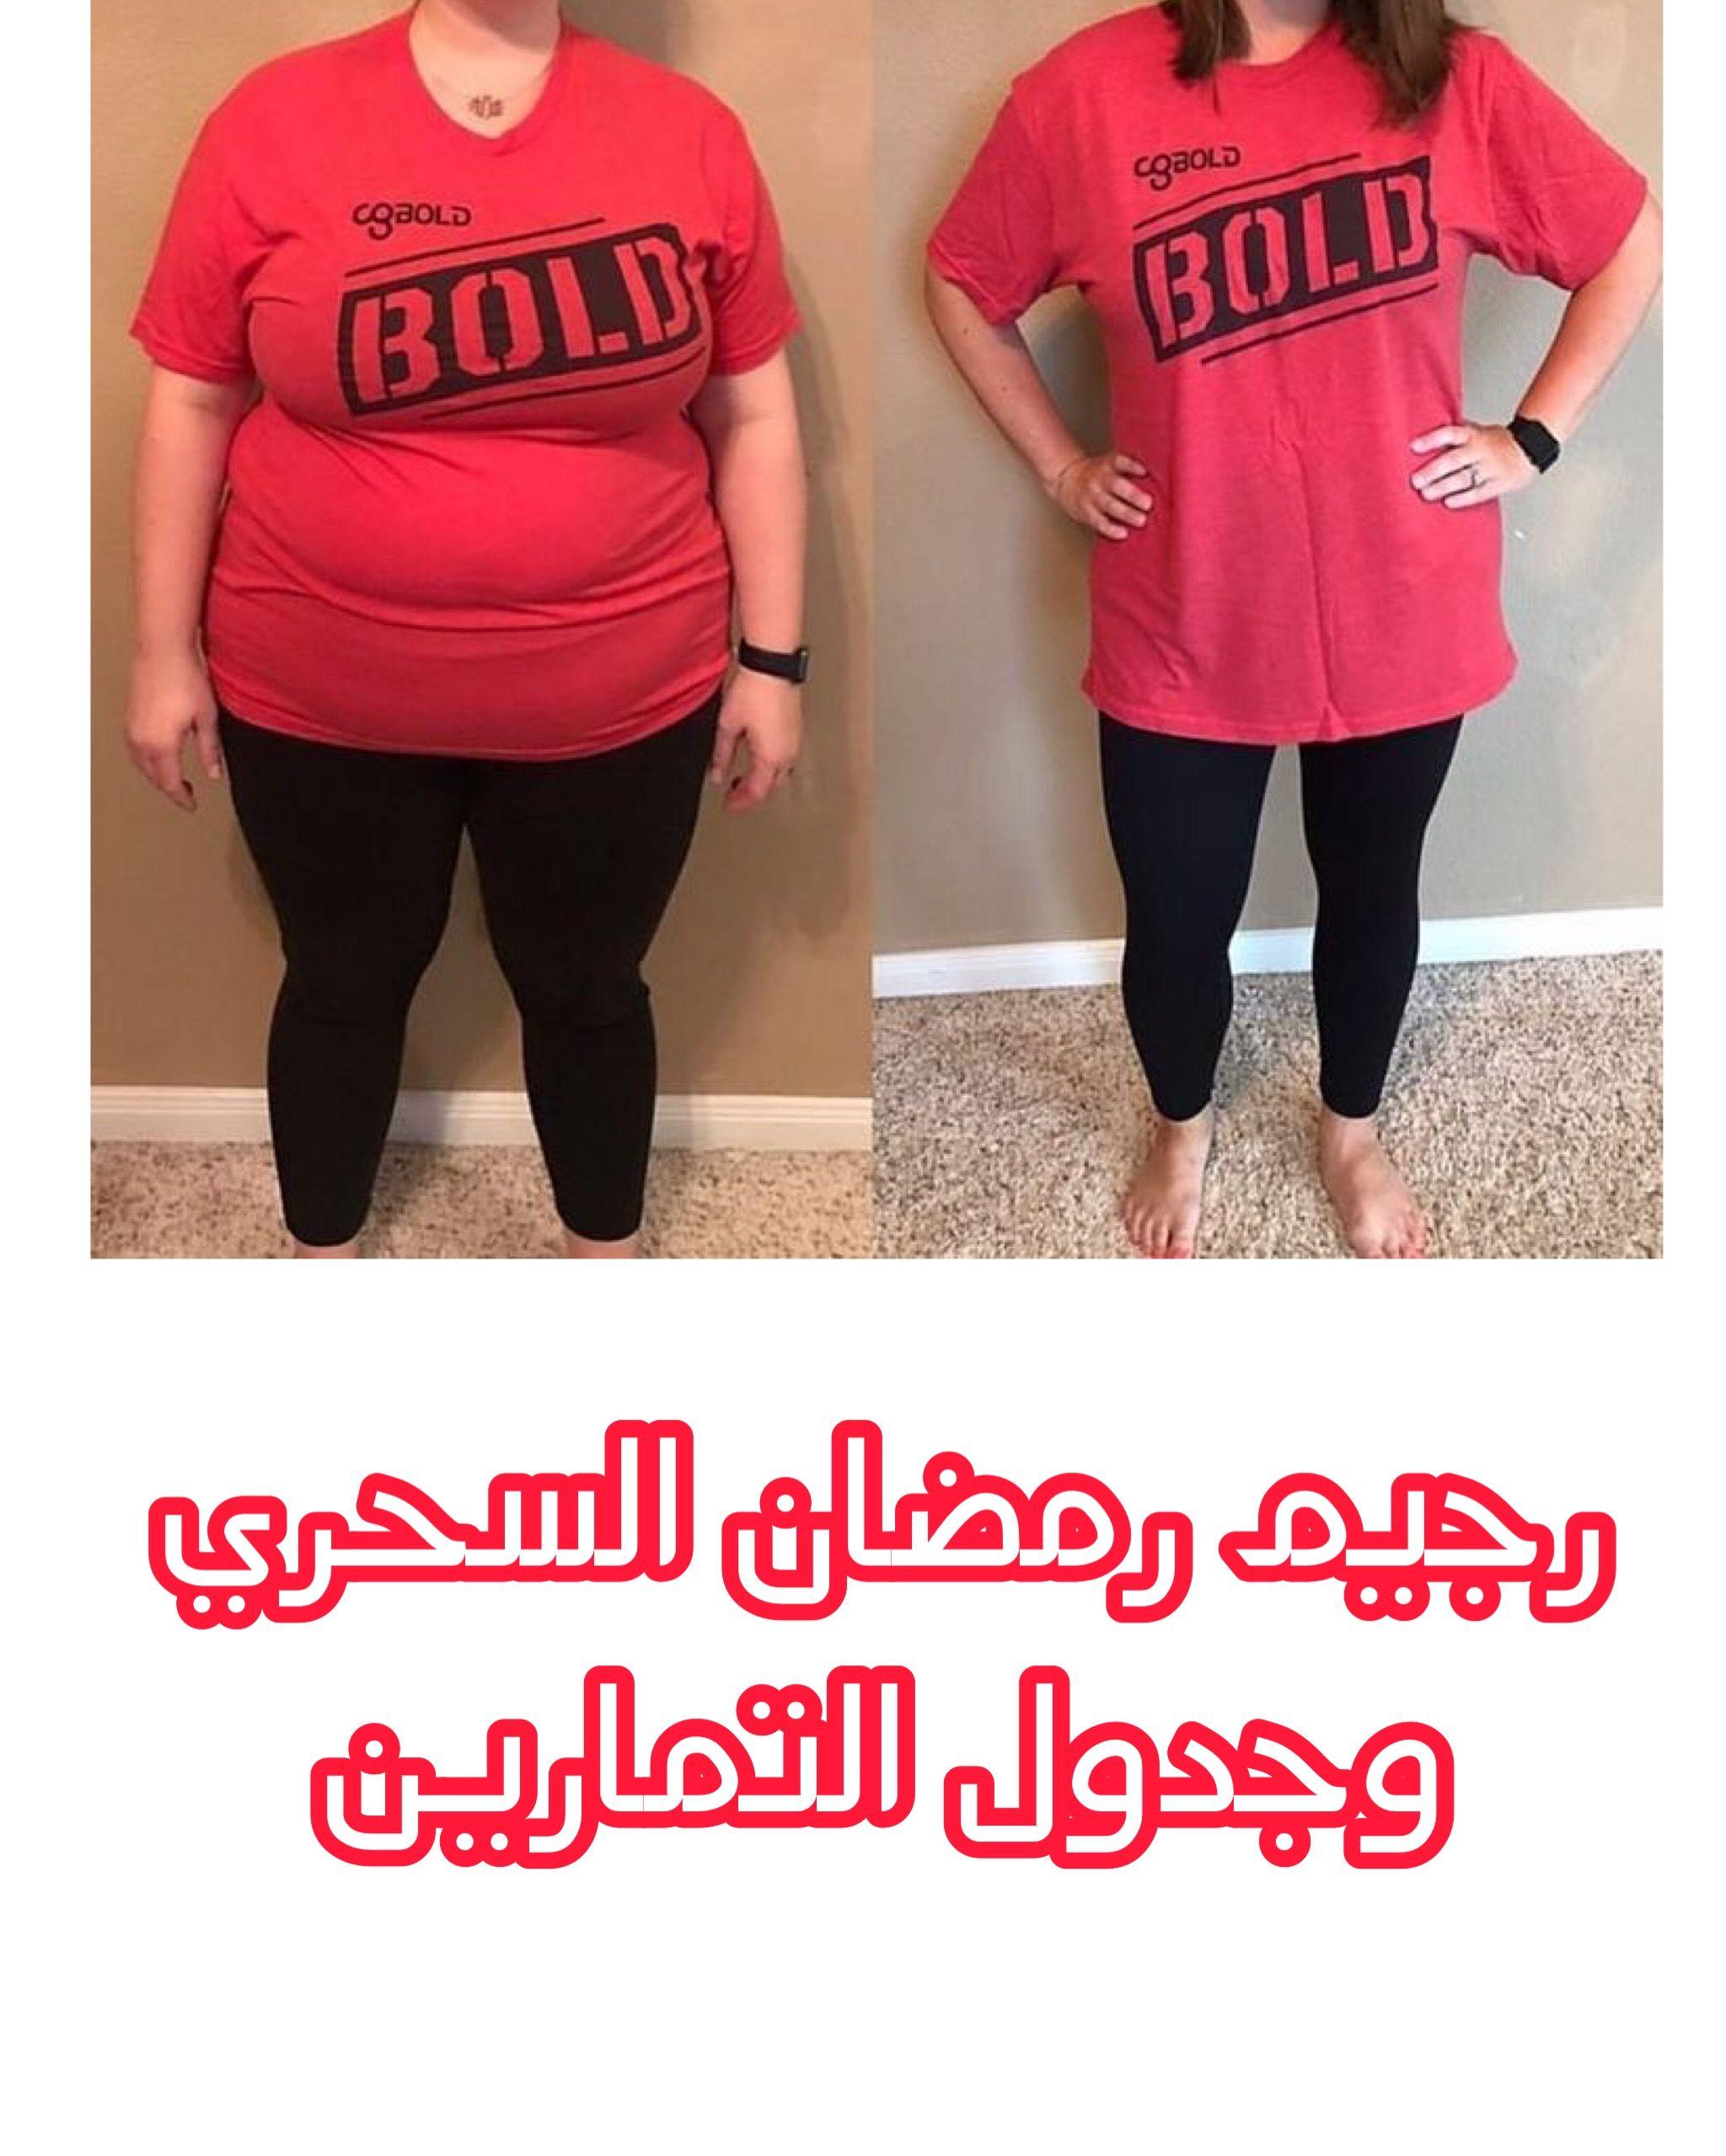 وأخيرا نظام رمضان جدول التمارين لإنقاص ١٥ كيلو دهون بدون حرمان Youtube Women Women S Top T Shirt